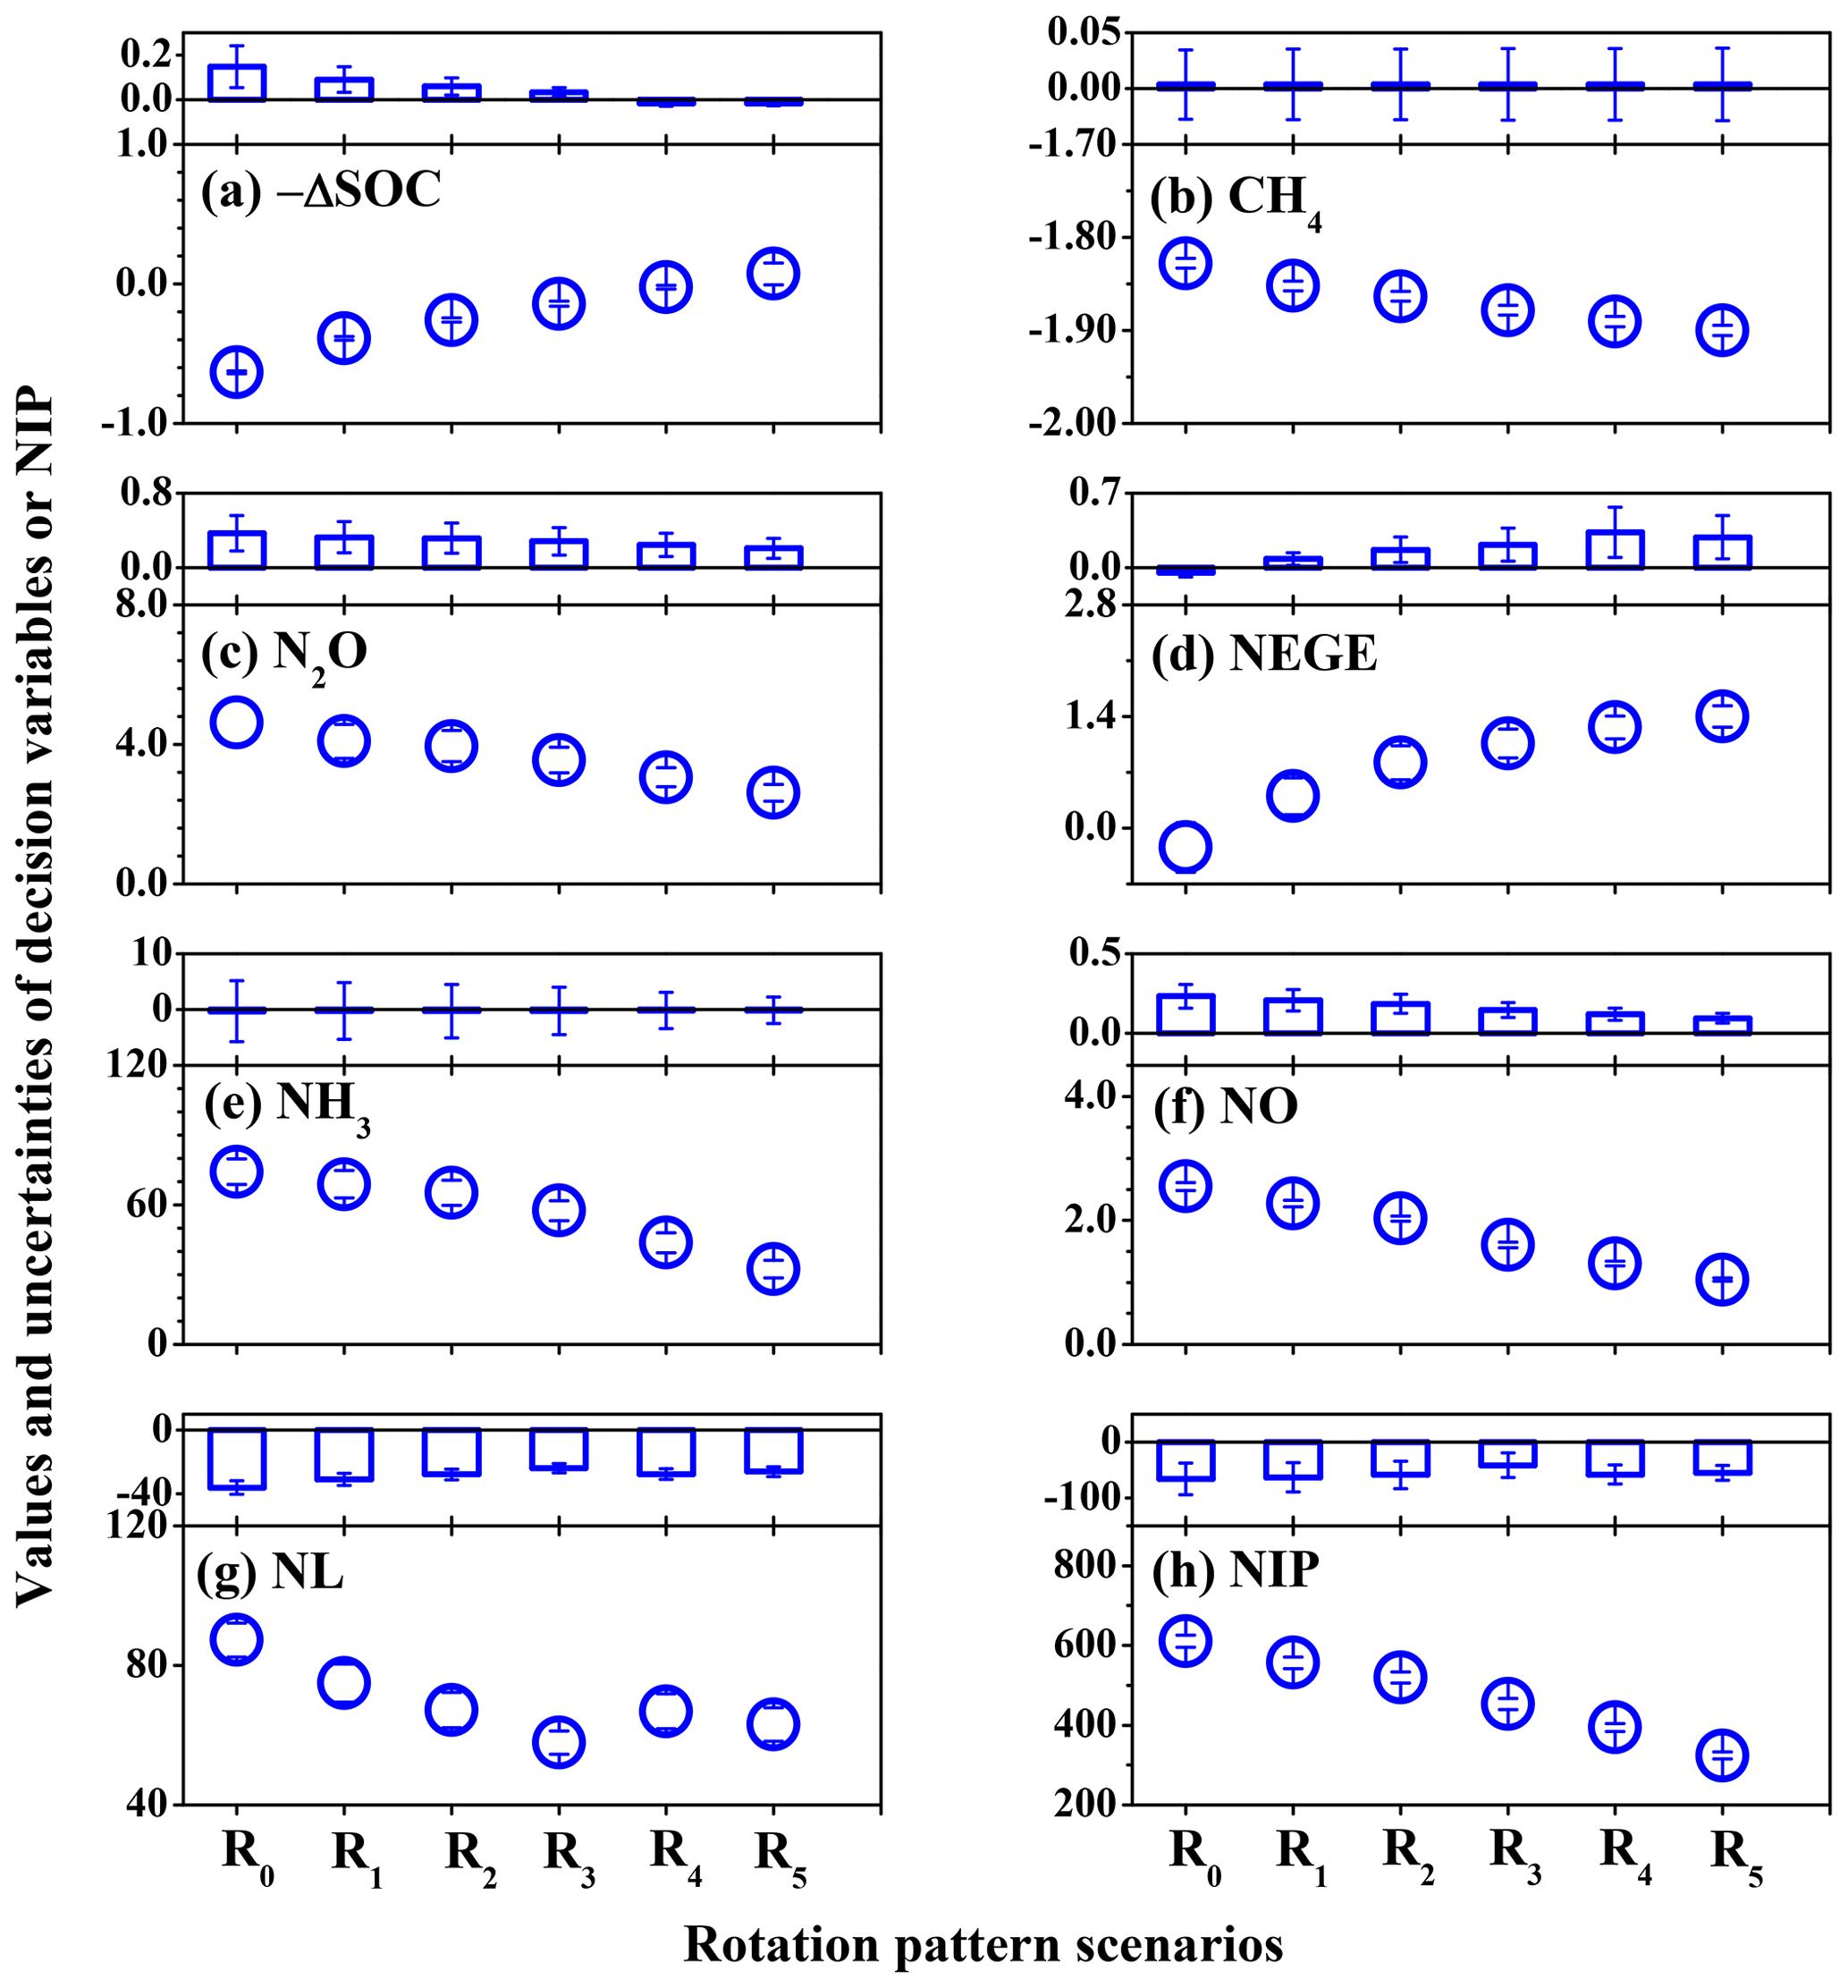 BG - Using a modified DNDC biogeochemical model to optimize field